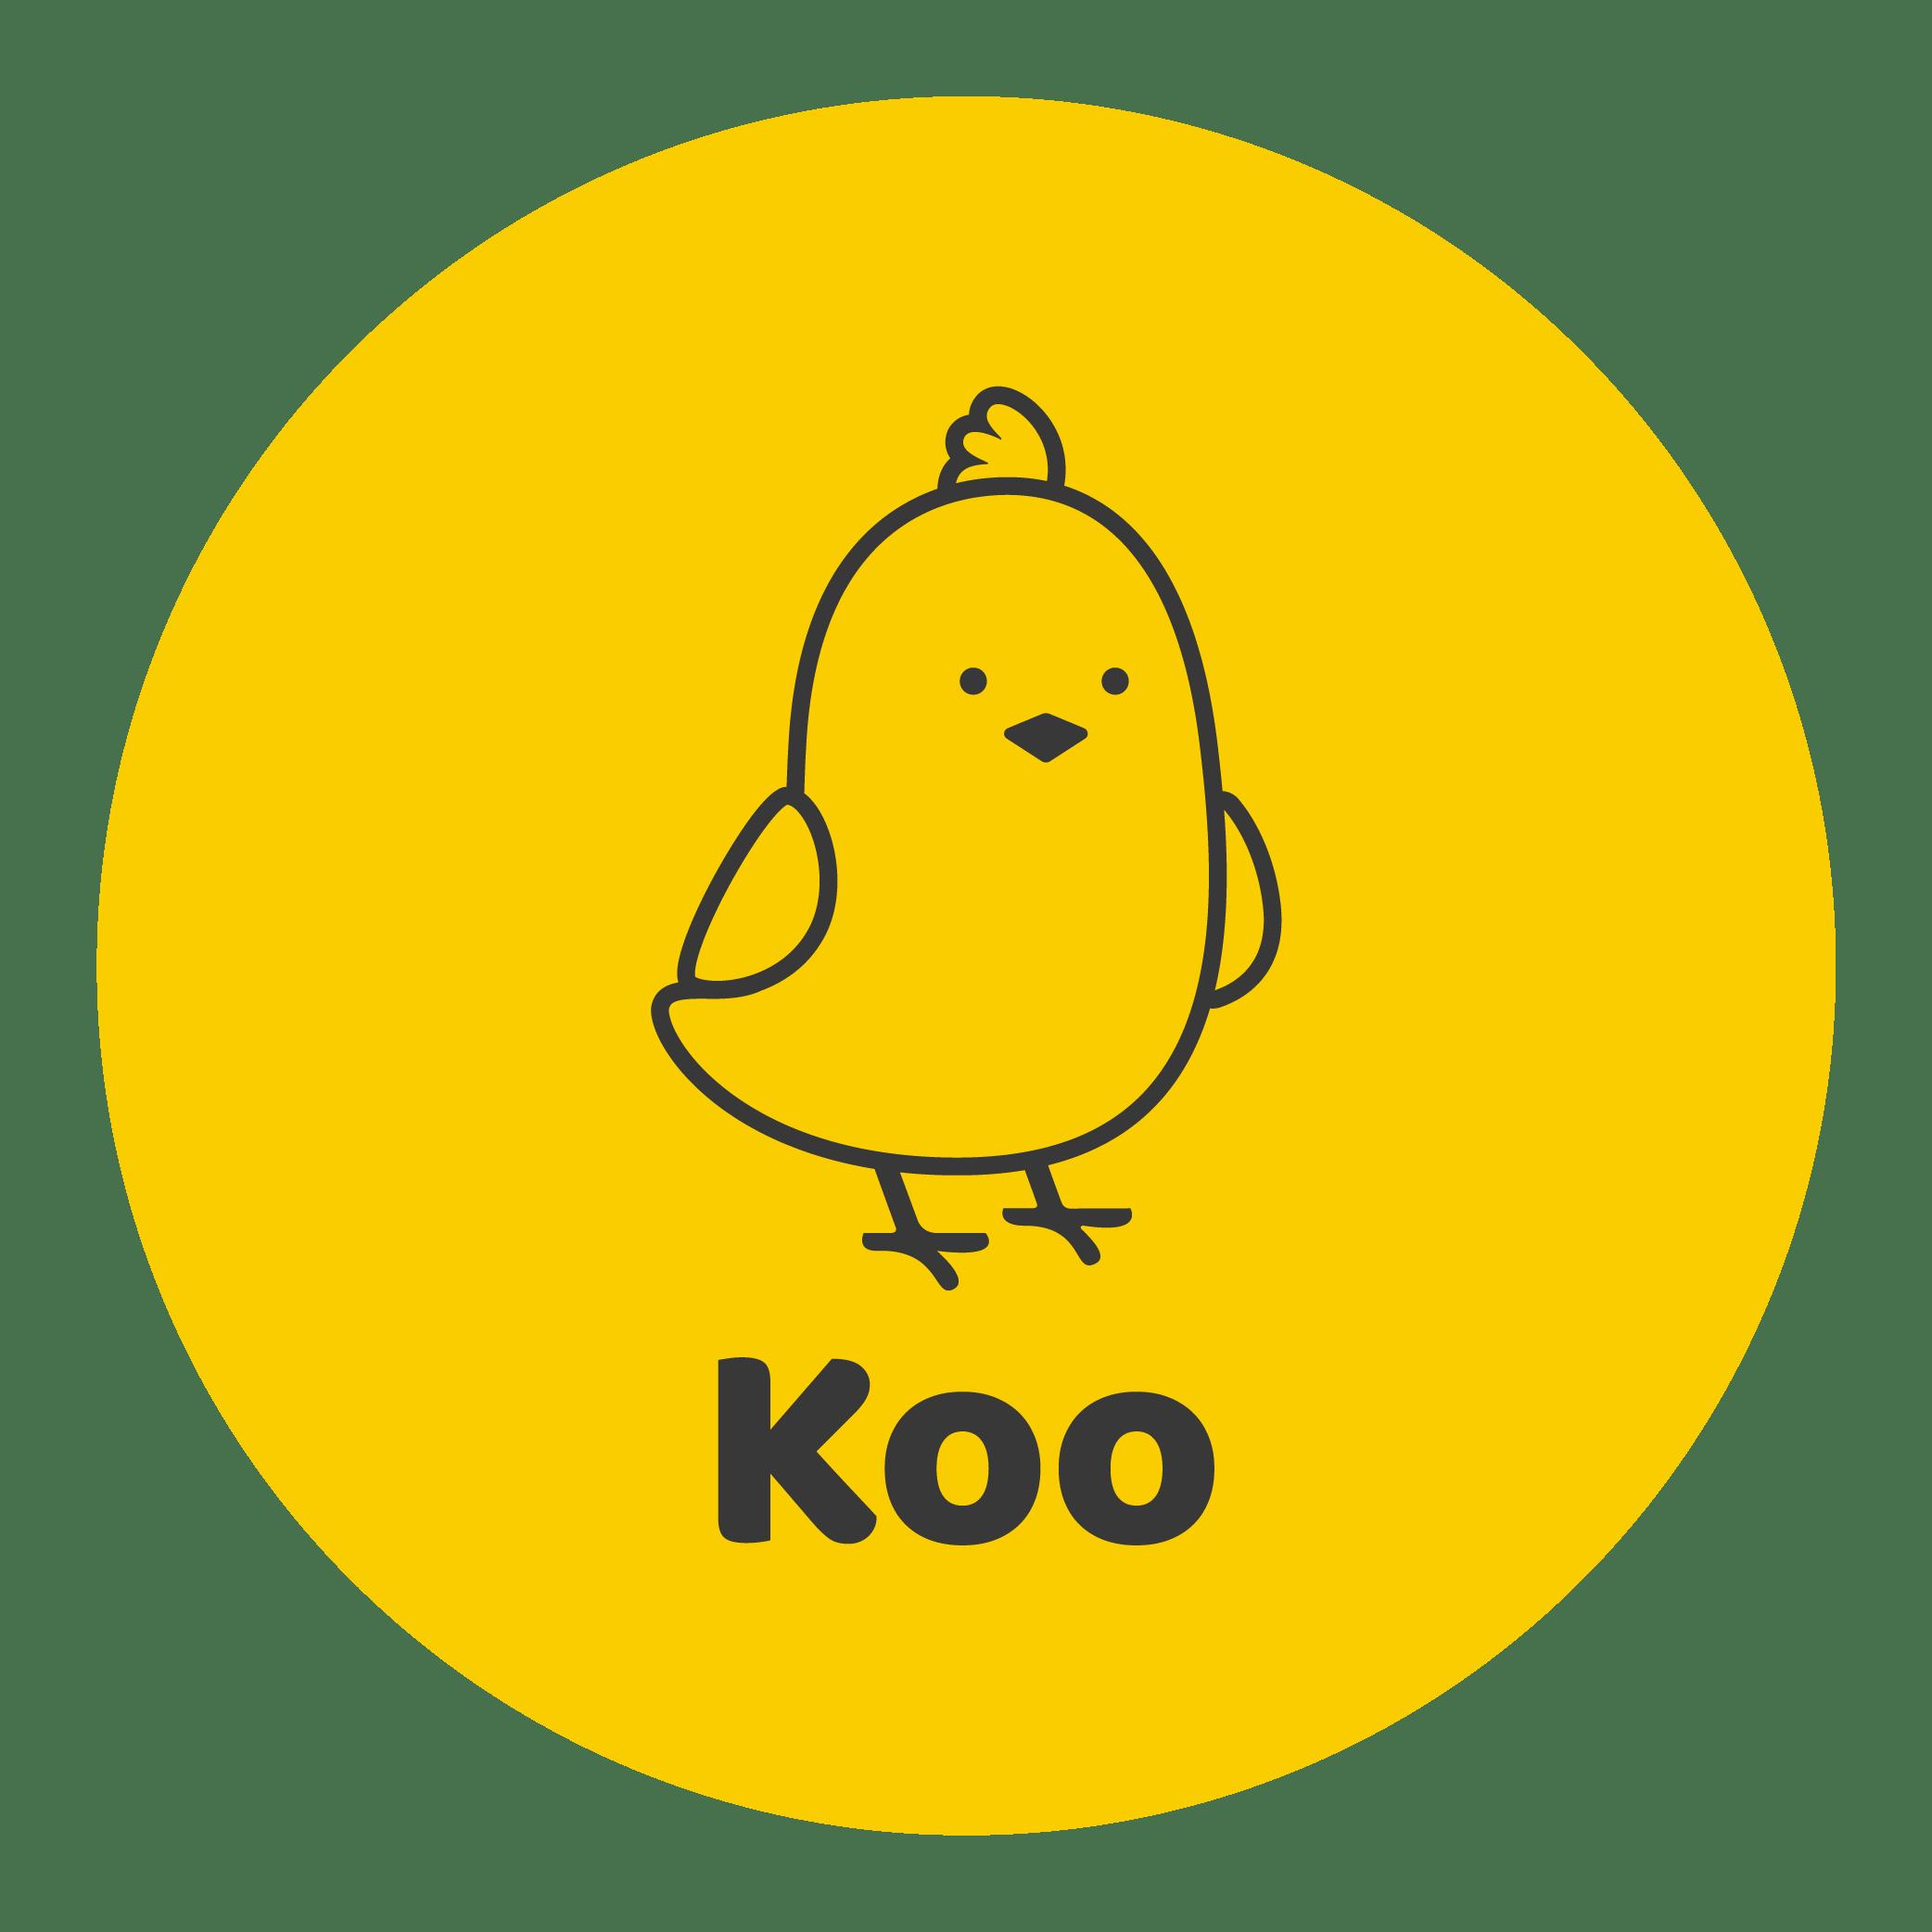 koo_icon